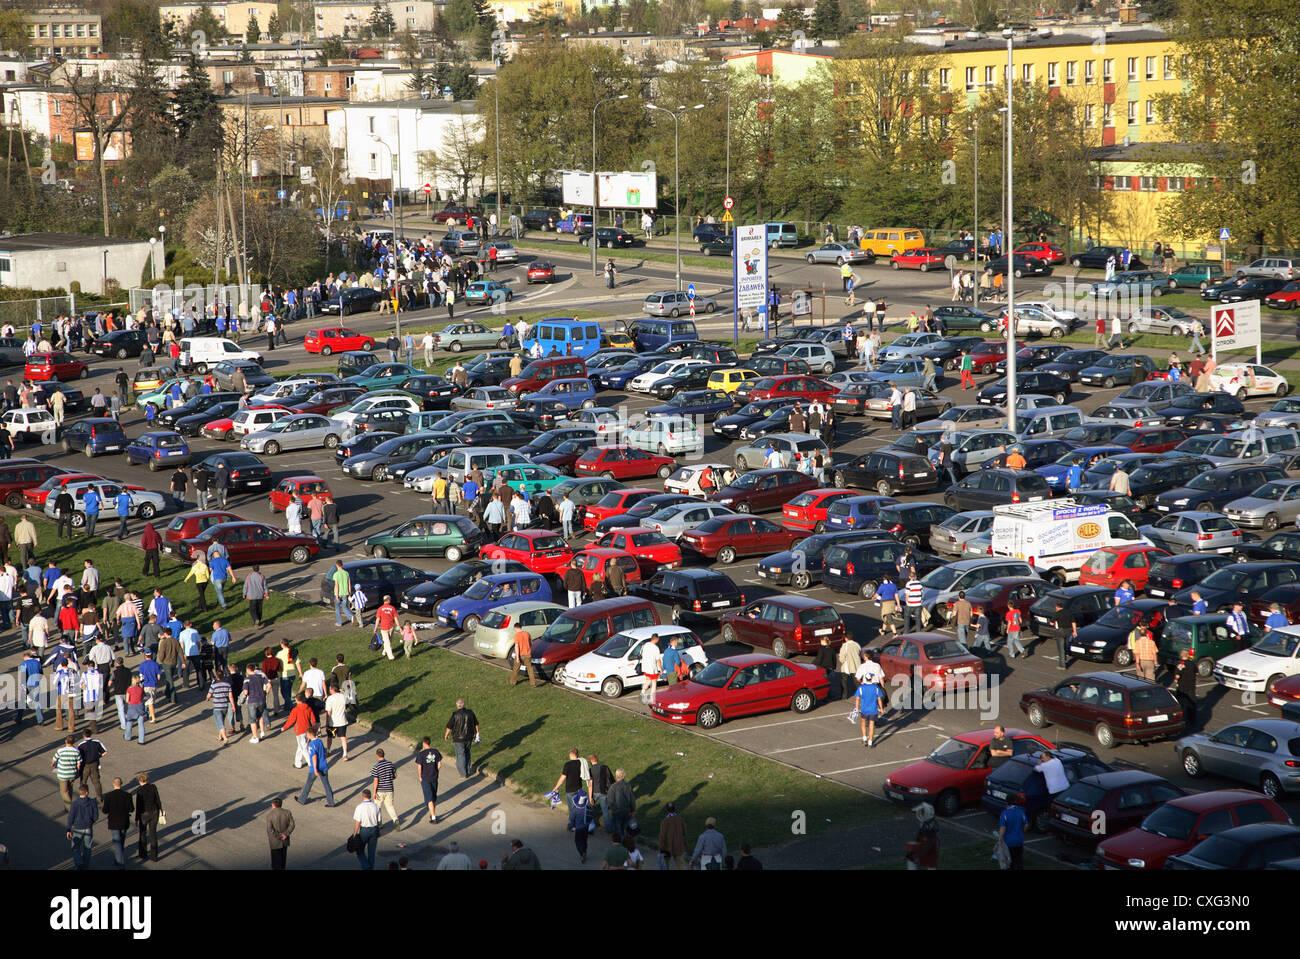 Lech Poznan News: Parking At The Stadium For A Home Game Lech Poznan, Poznan